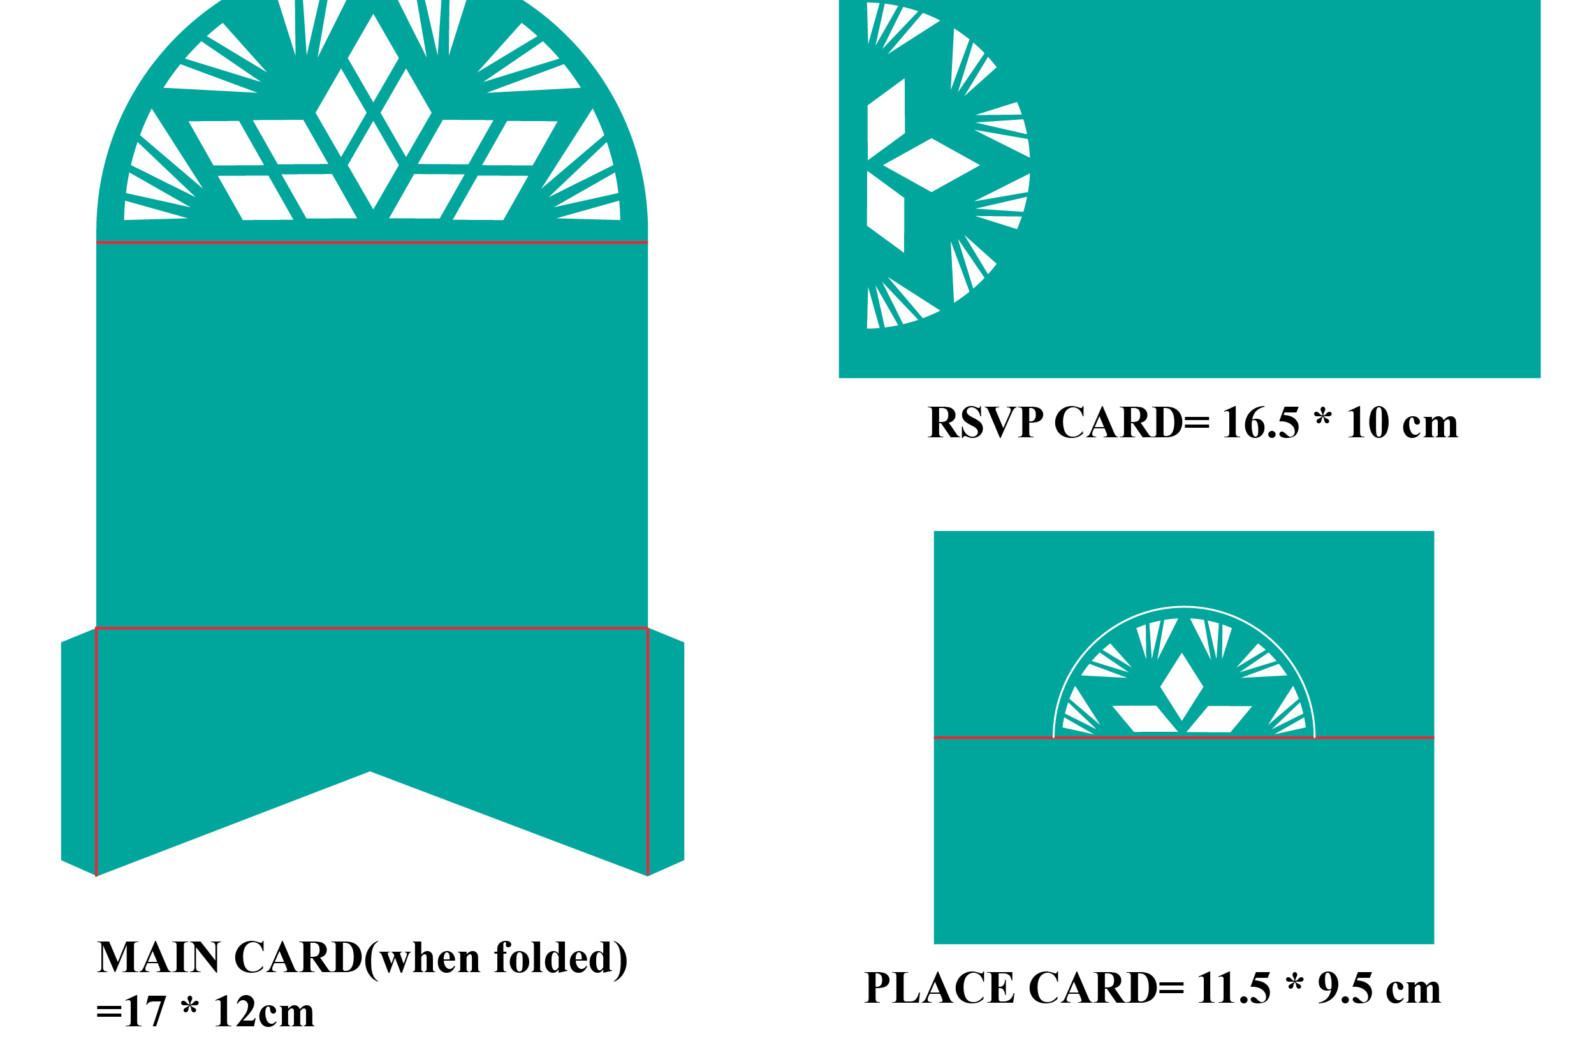 Geometric pattern wedding invitation set of 3 - Geometric patterned wedding invitation 01 -